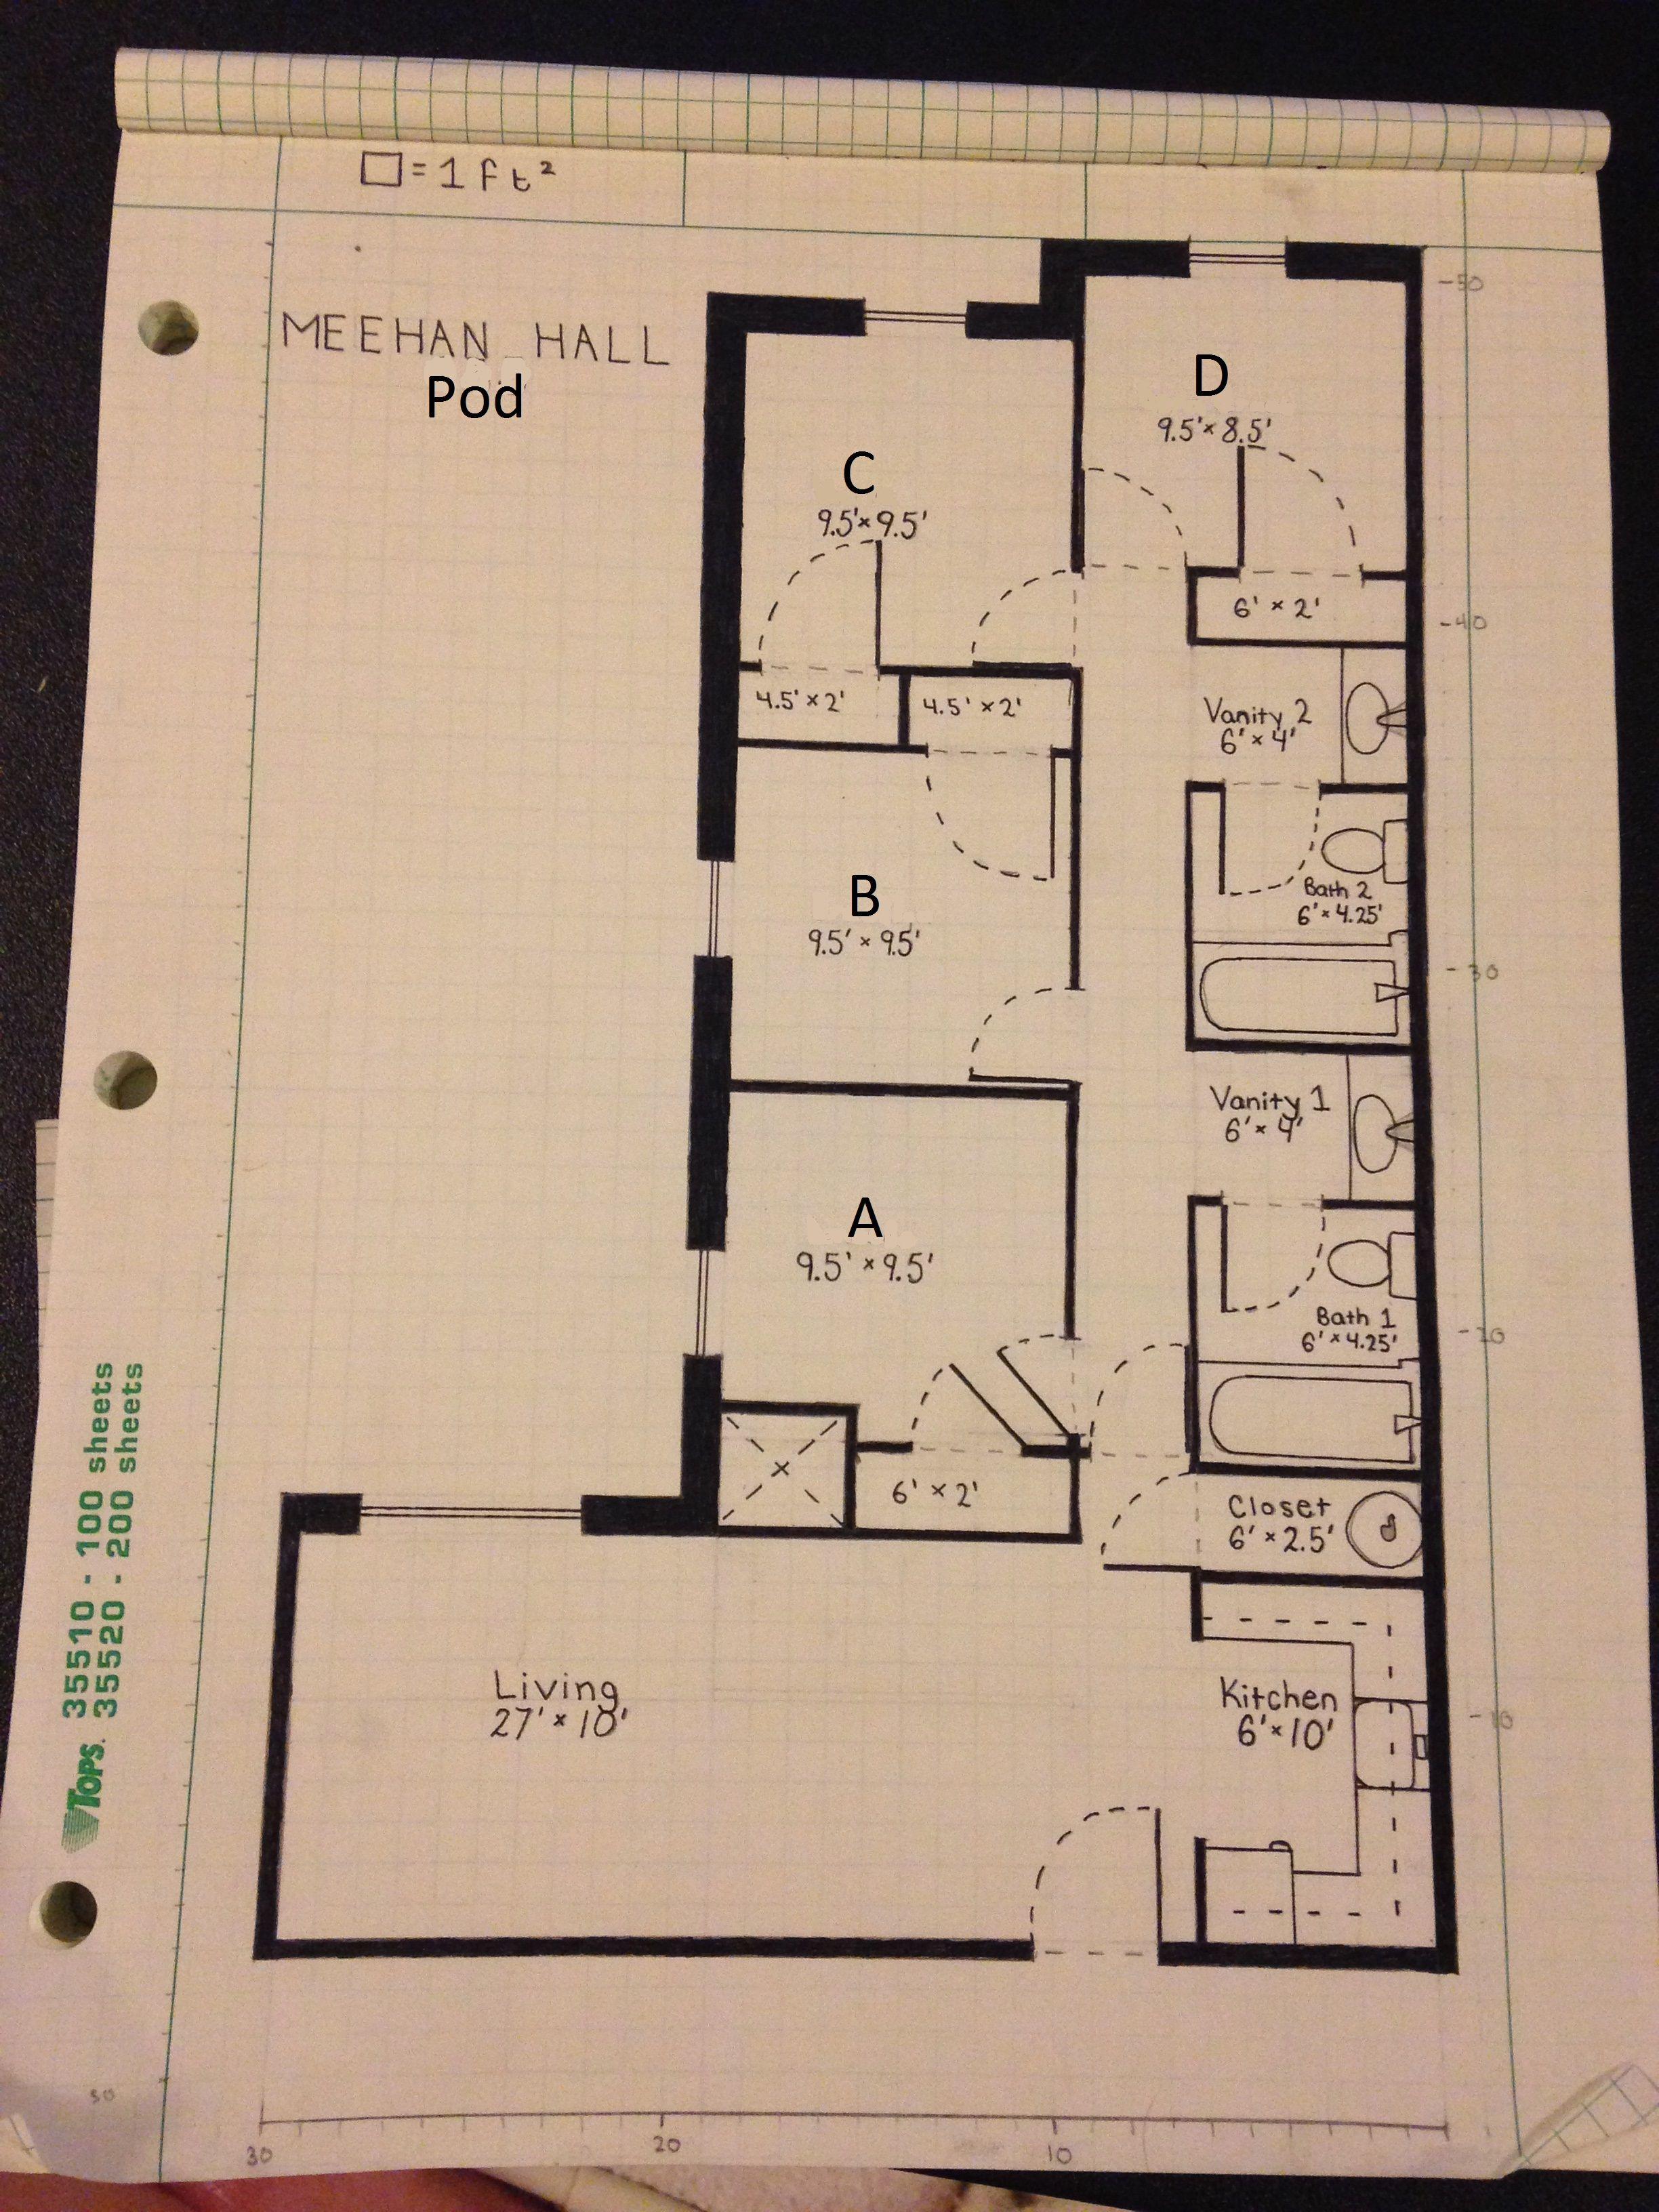 Stadium Tower Meehan Hall Pod Unit Floor Plan Living Room Left Side Version Dorm Planning Hall Floor Plans